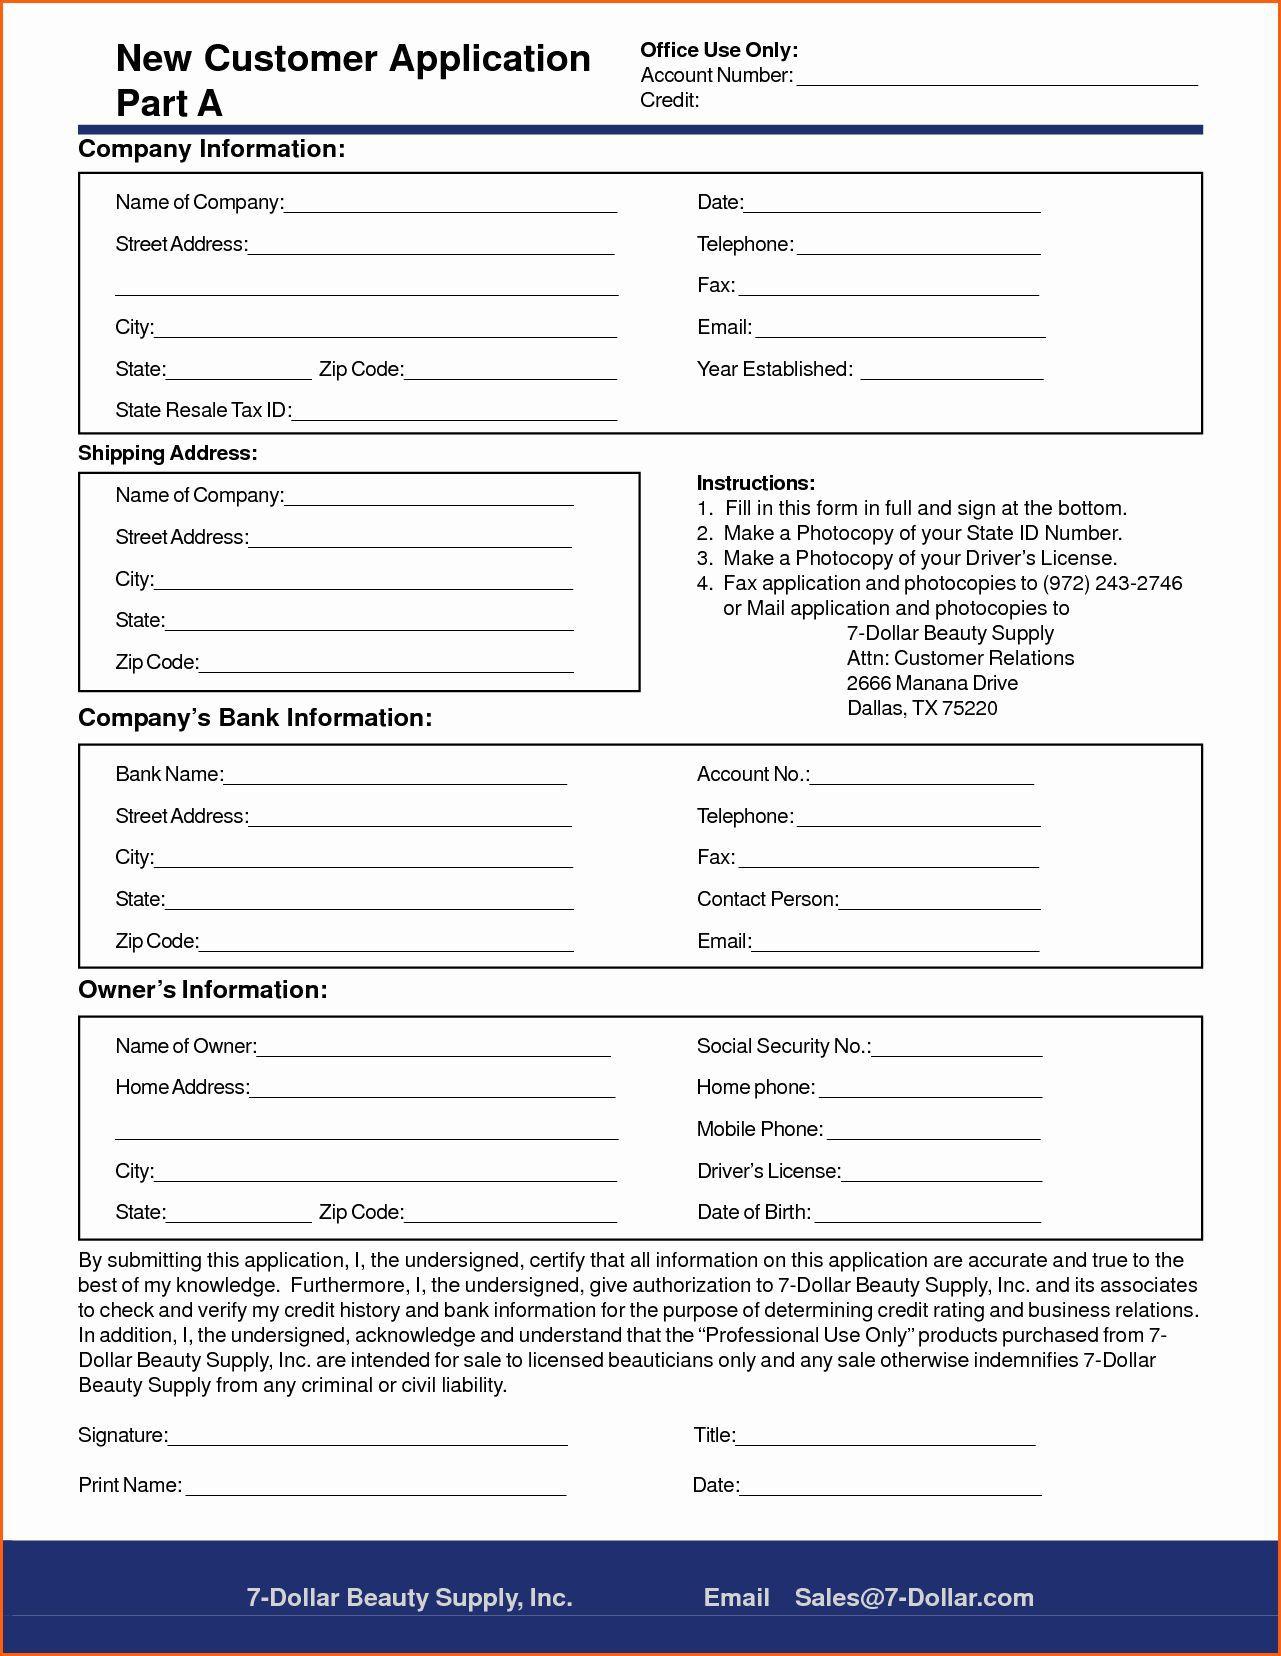 005 Rare New Customer Form Template Word Photo  Registration Account FeedbackFull